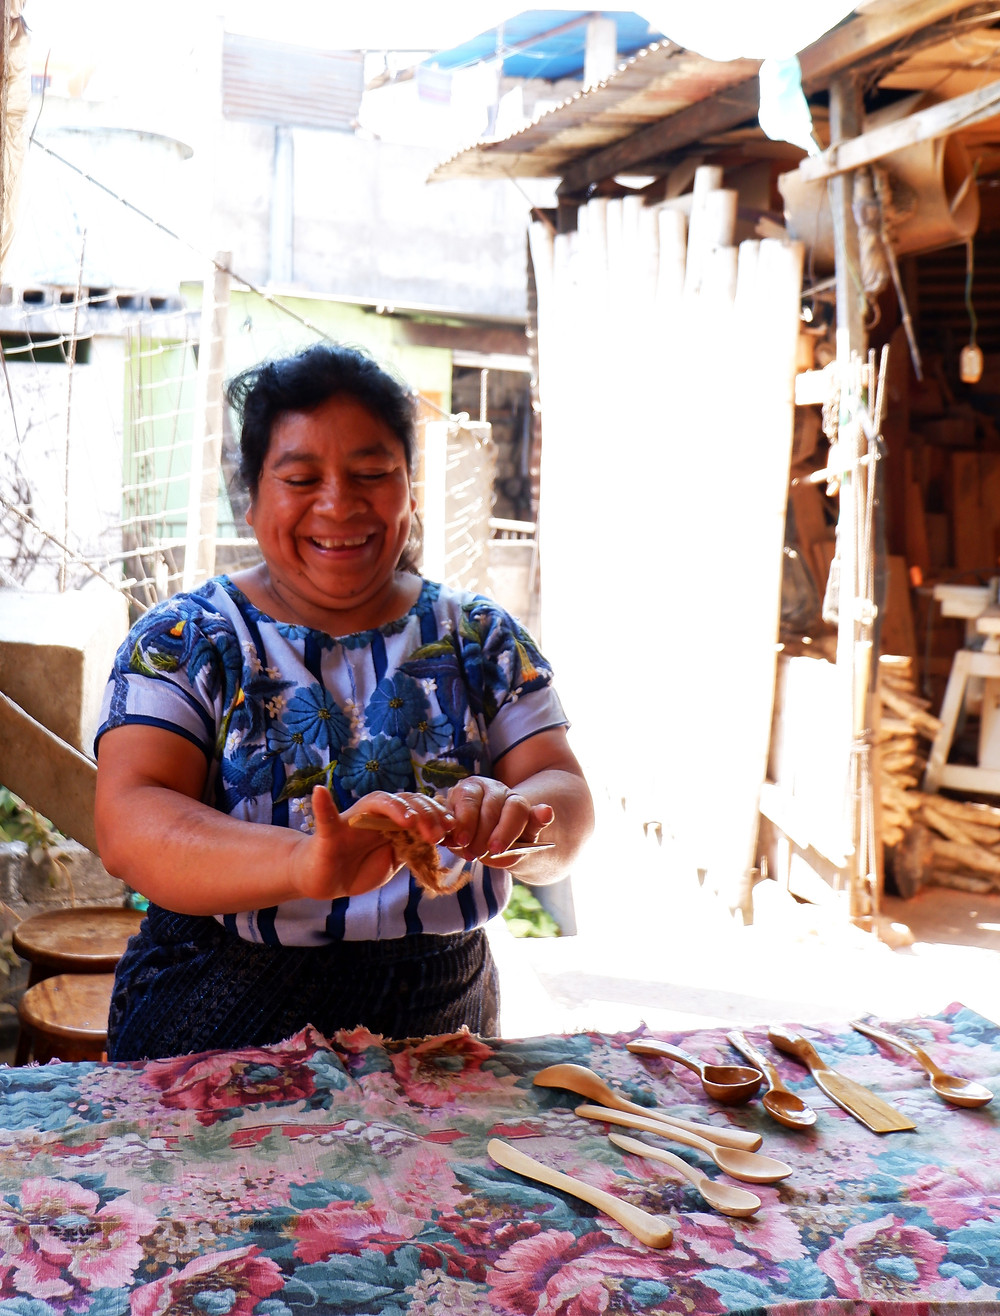 Lady in traditional Guatemalan Traje polishing wooden cutlery